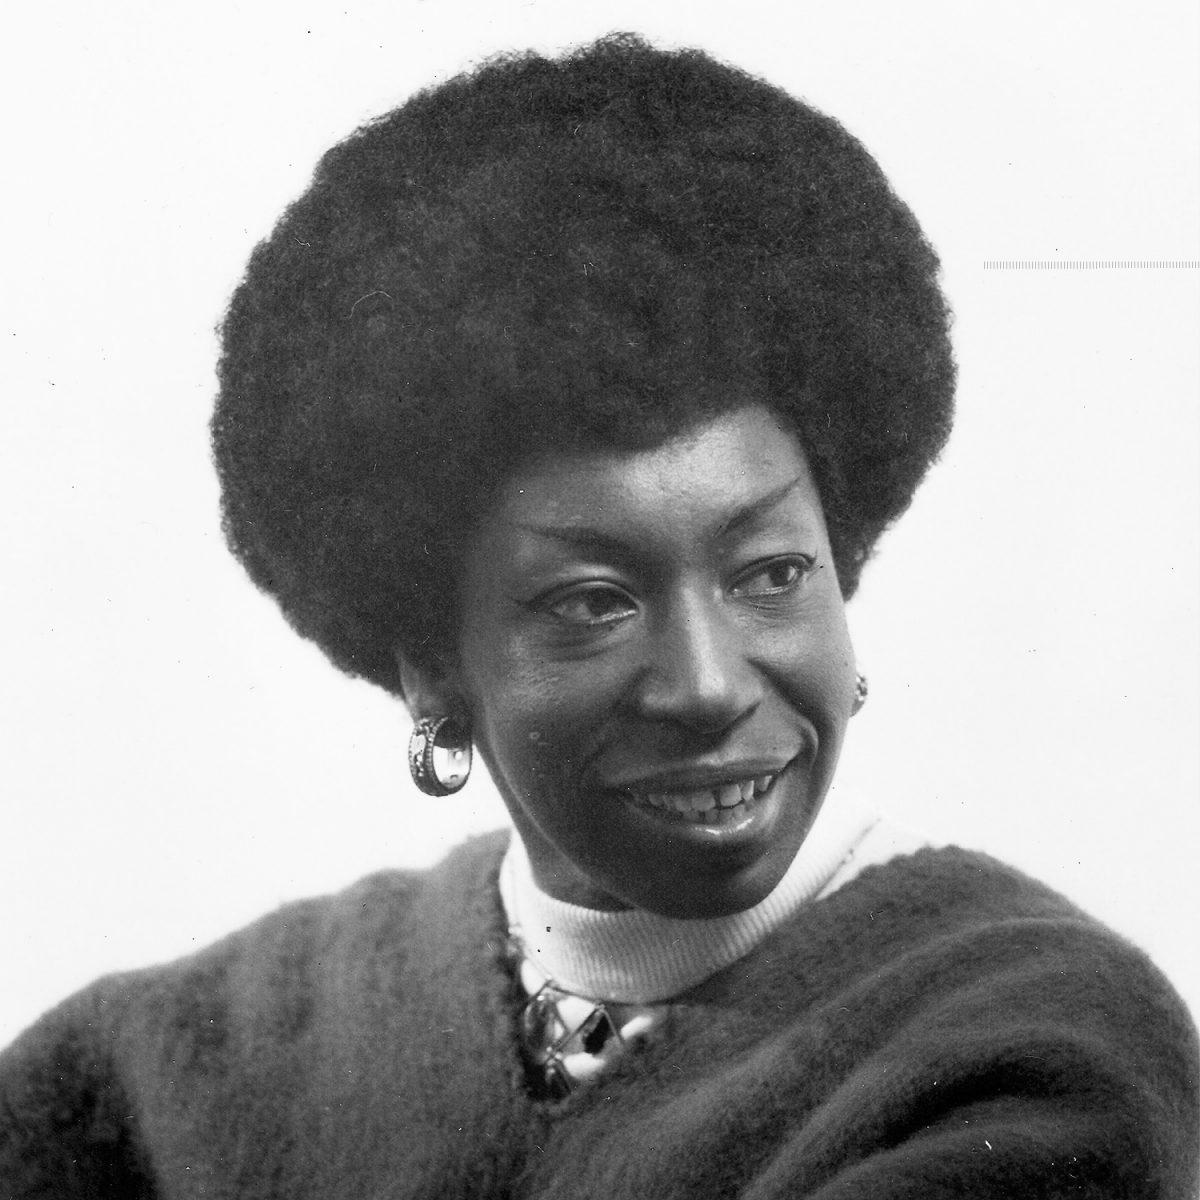 Victoria-santa-cruz-black-history-afro-peru-afro-latina-black-mom-blogger-negra-bohemian